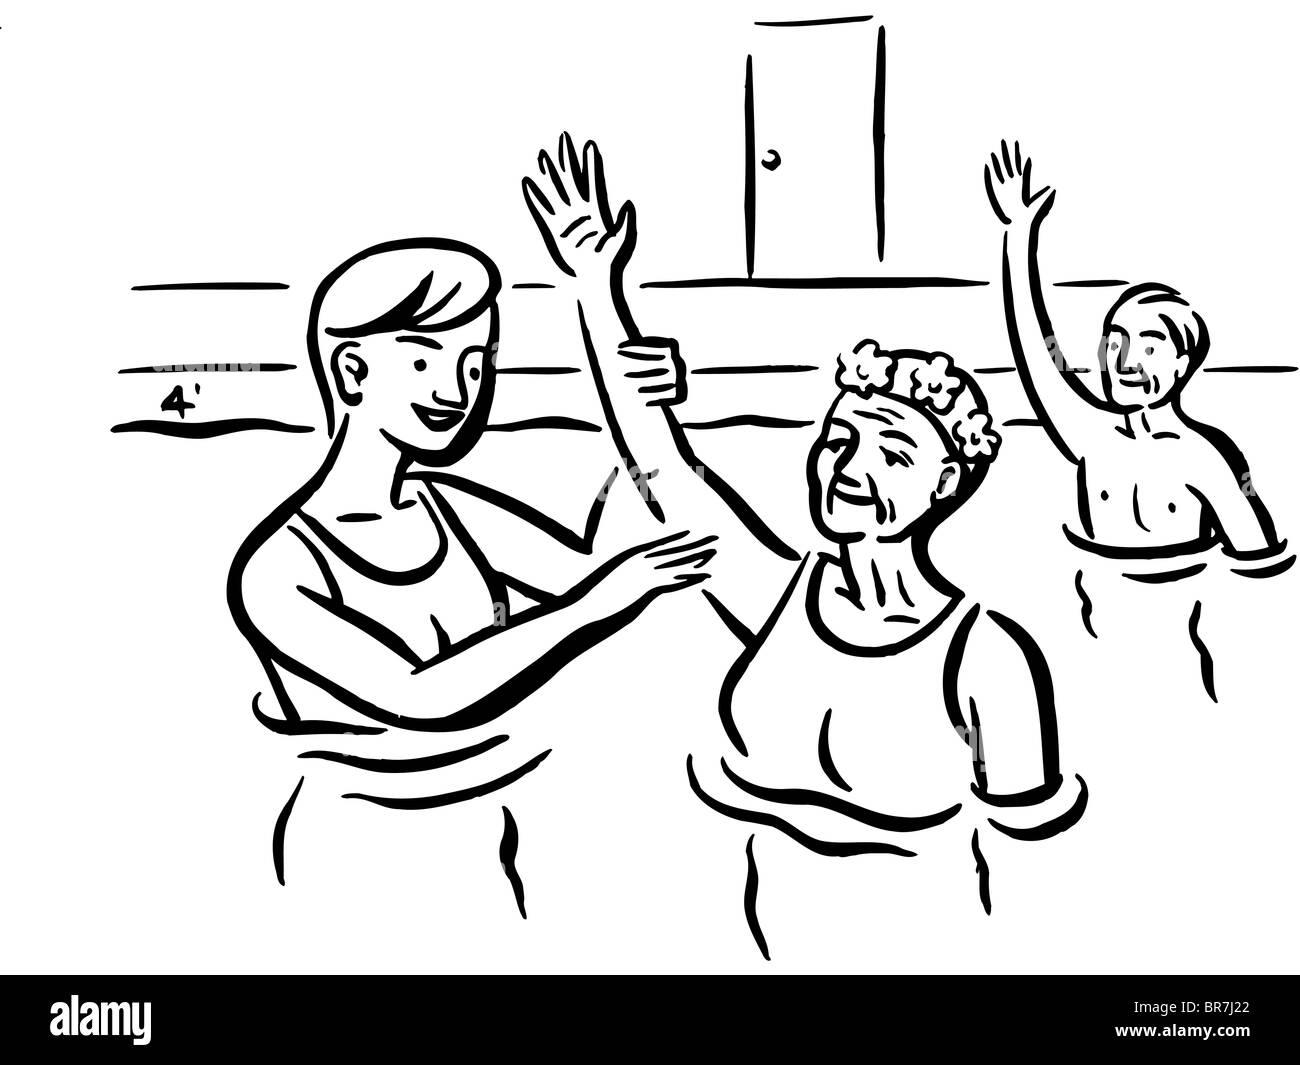 Elderly folks attending a water aerobics class - Stock Image